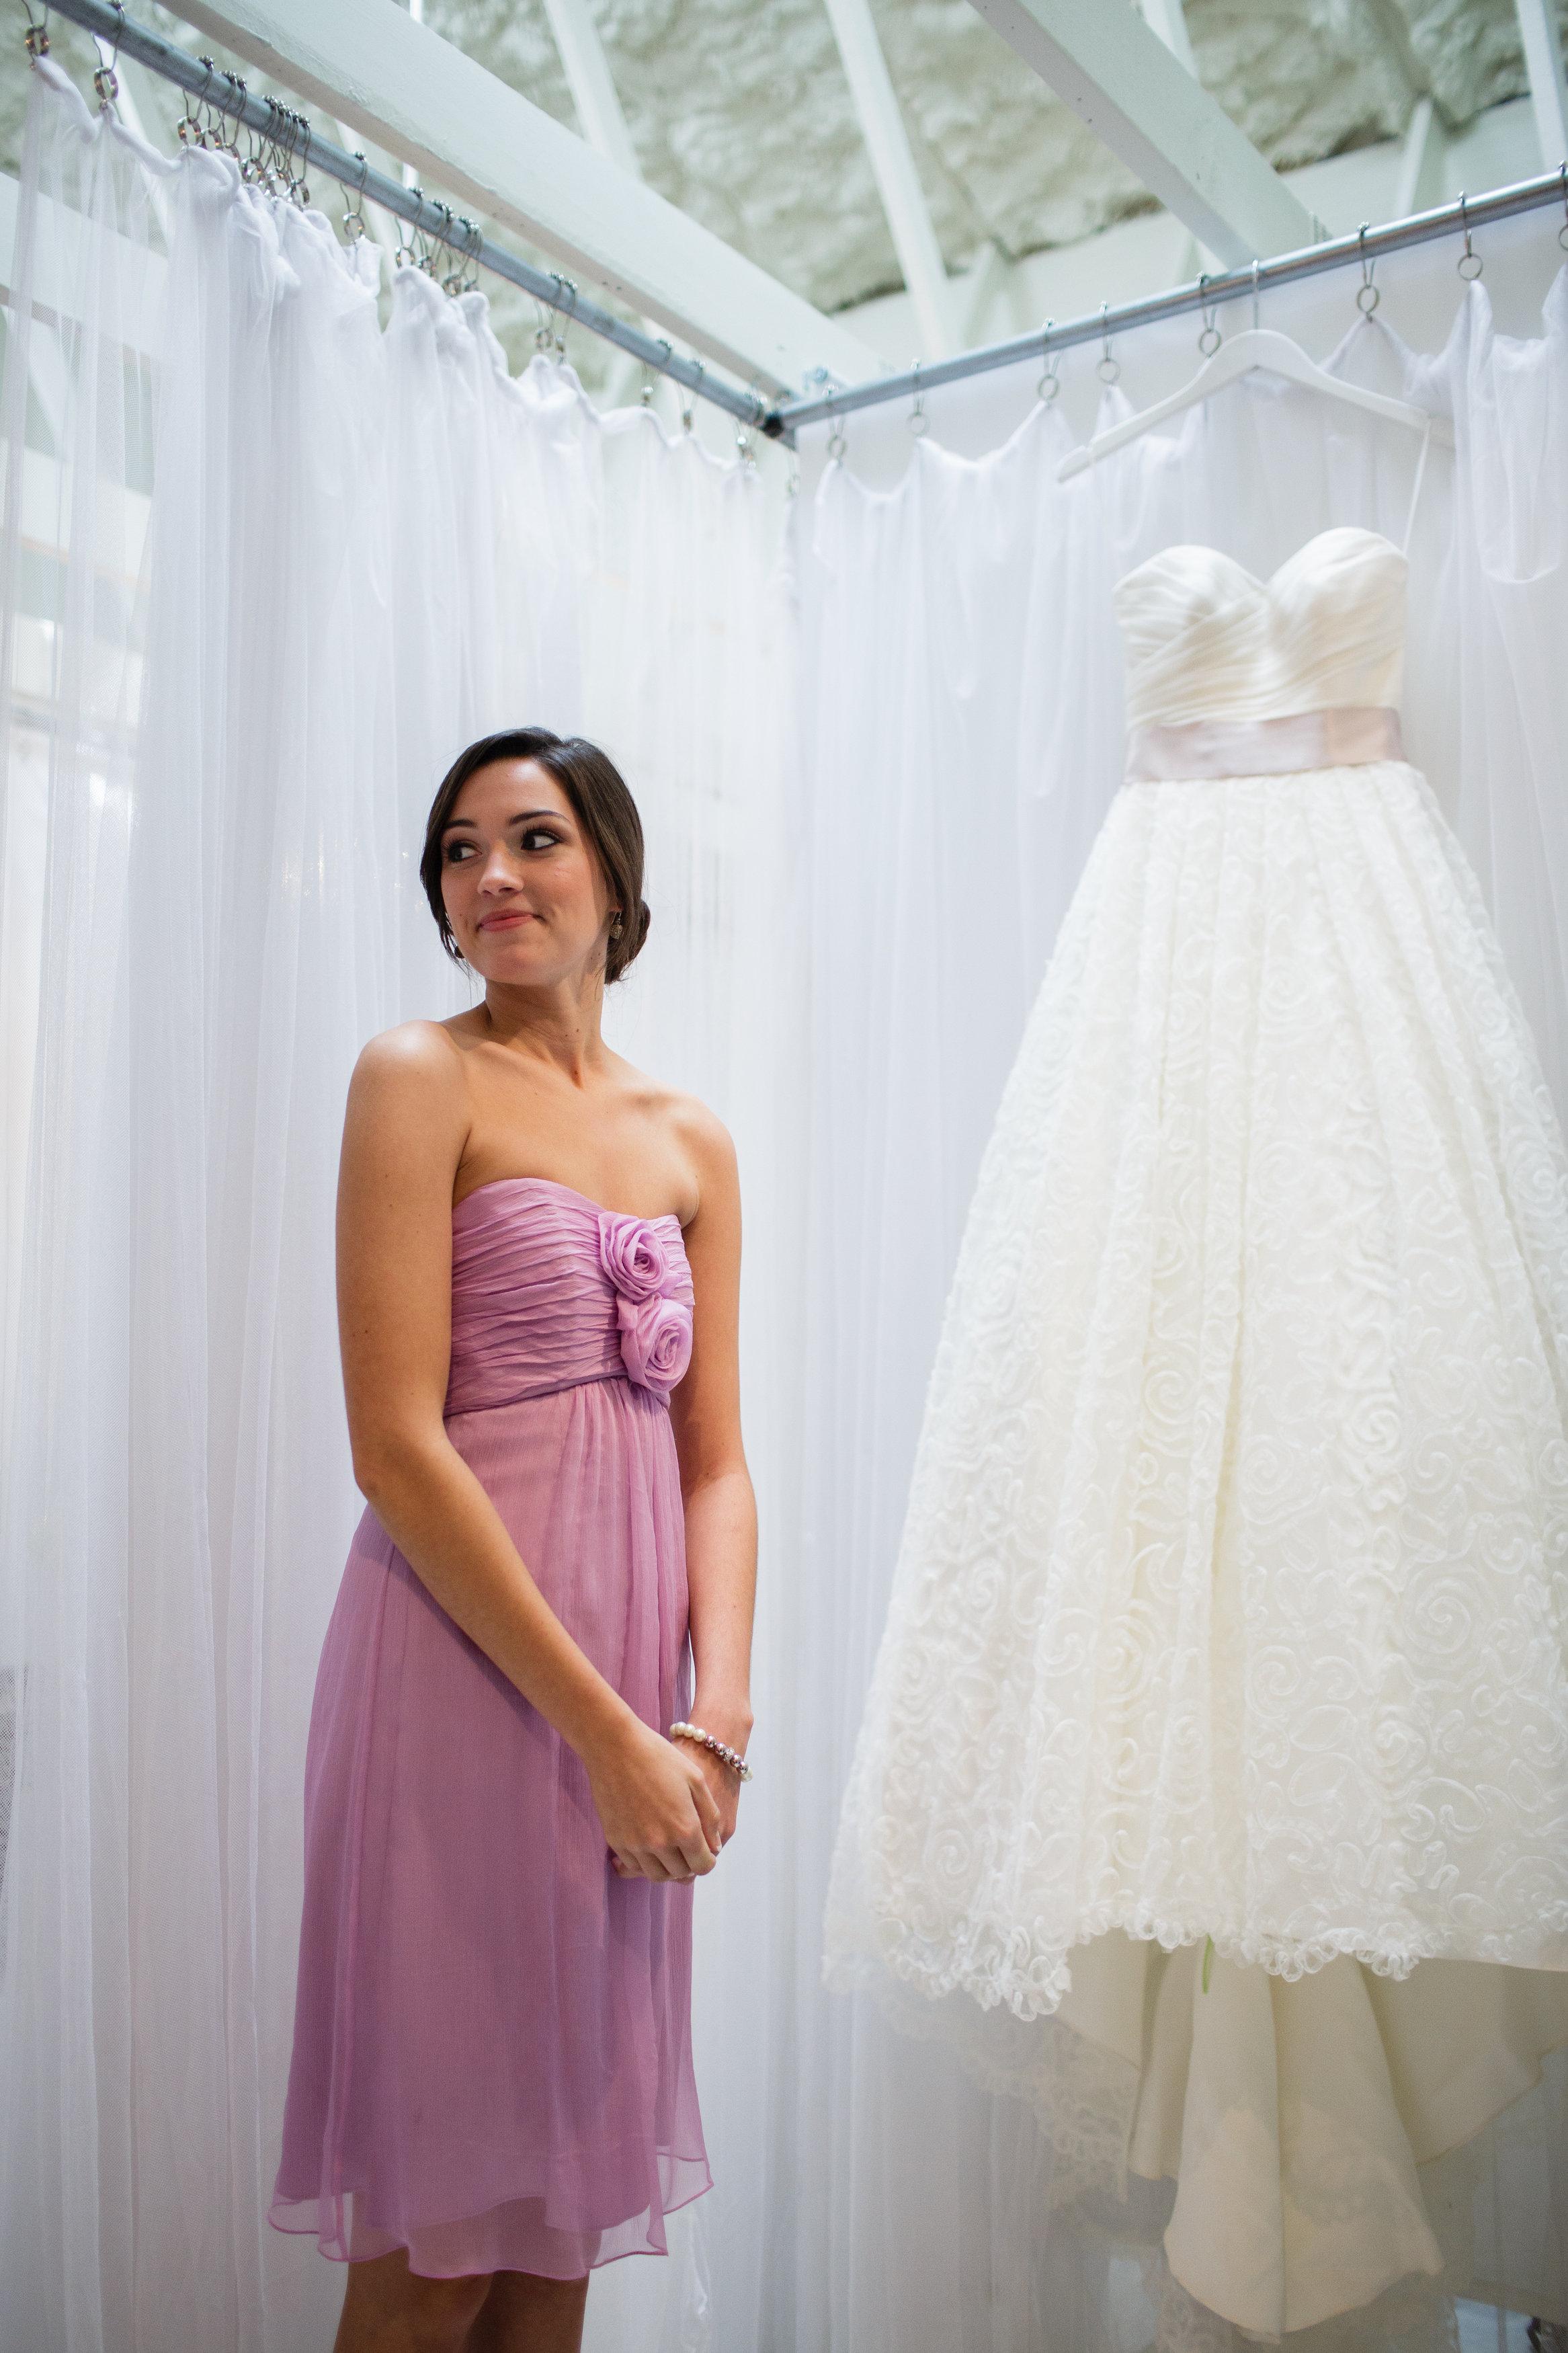 LaSuer Woodcock Wedding-04 Preparation-0193.jpg